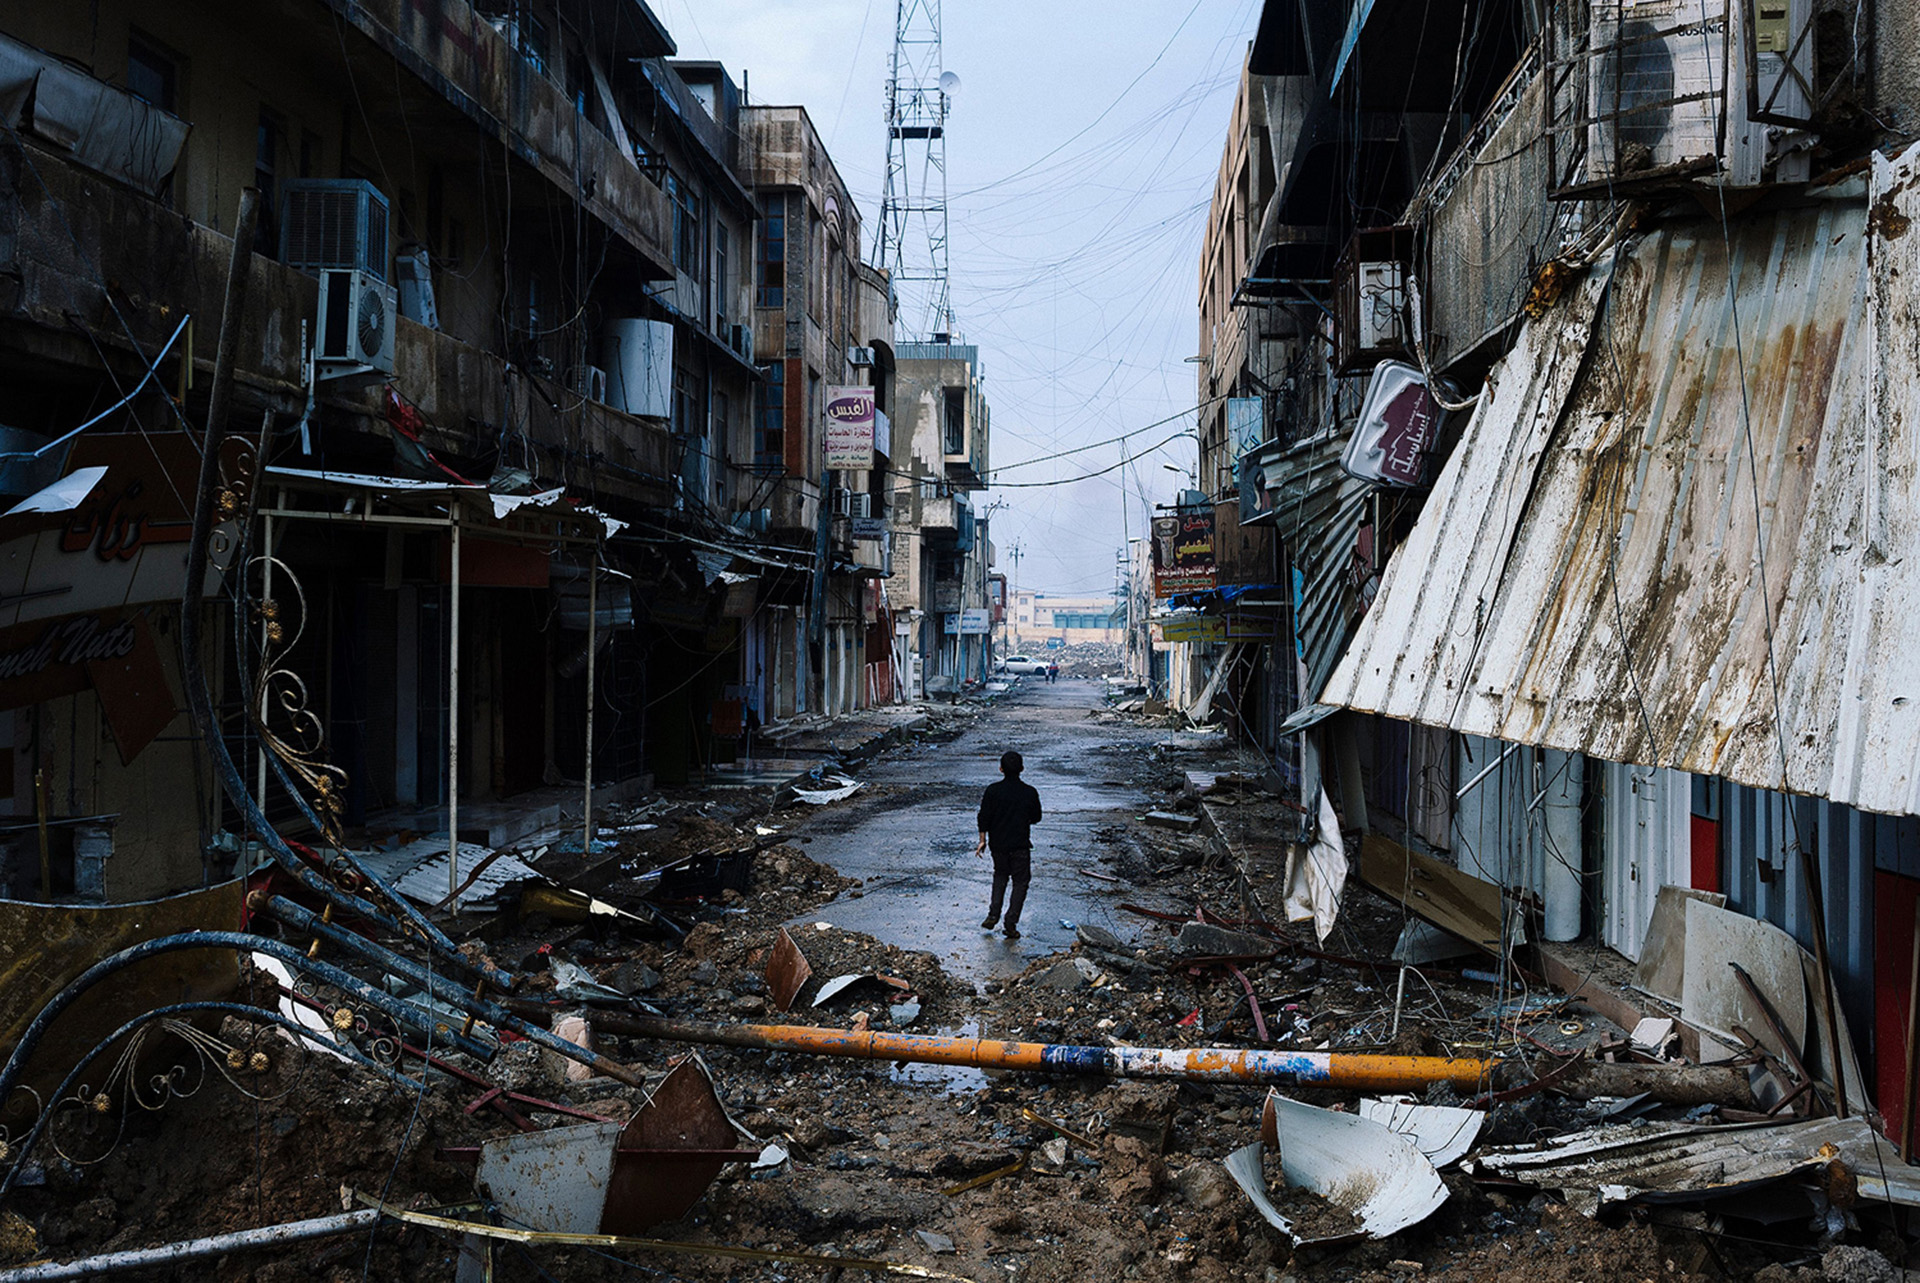 Un niño iraquí camina por las calles arrasadas (AFP)